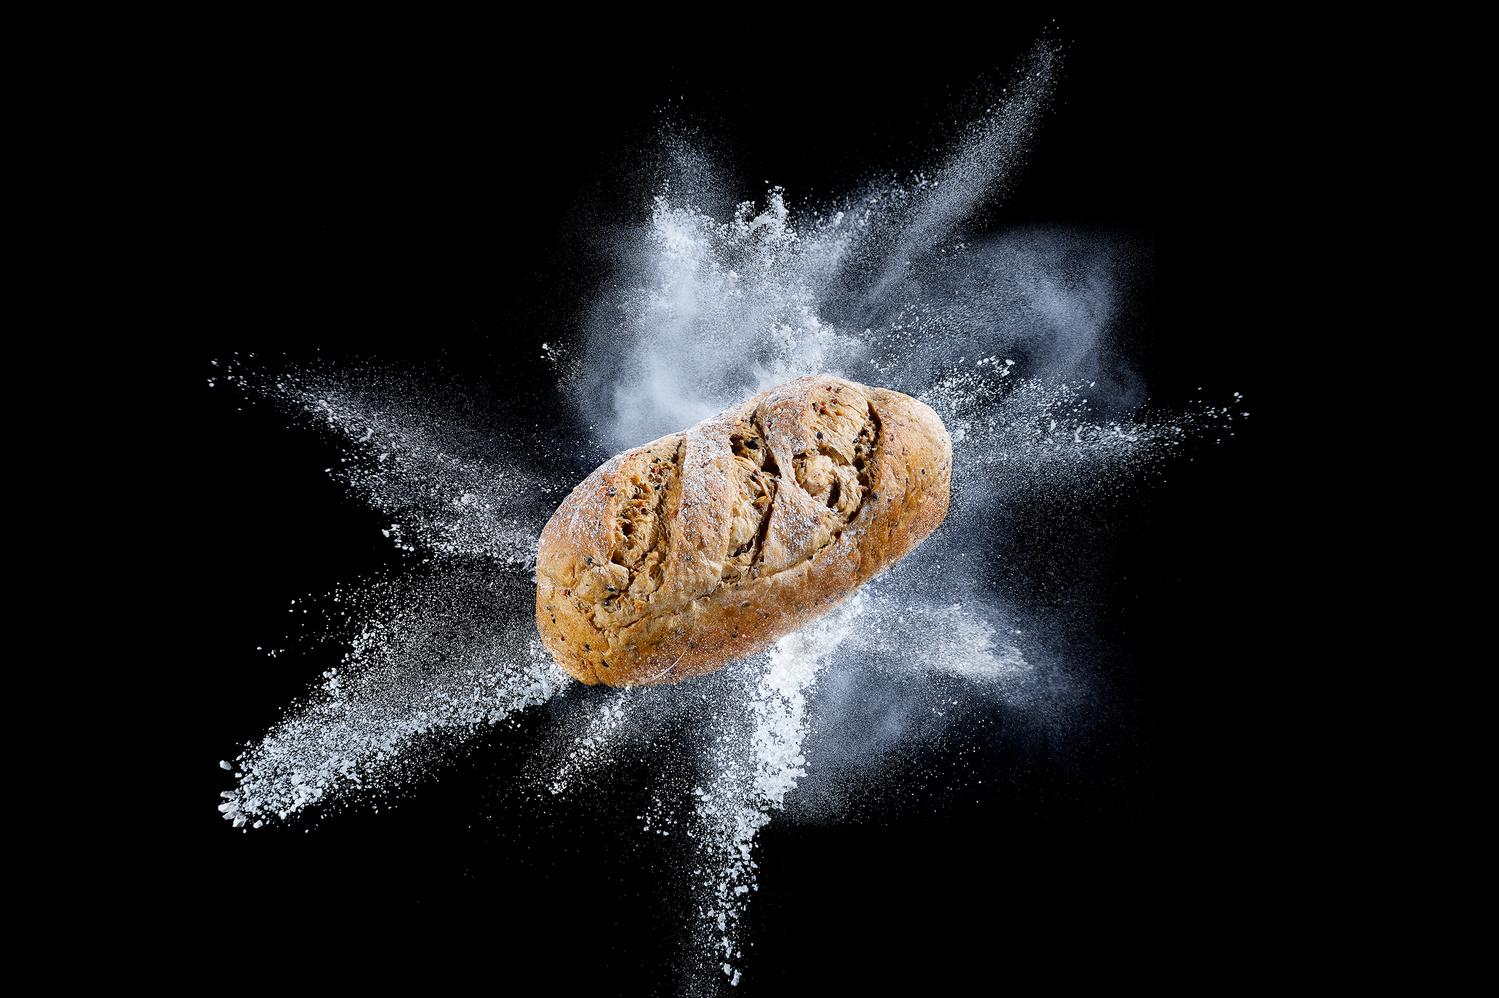 Powder bread by Hung Nguyen